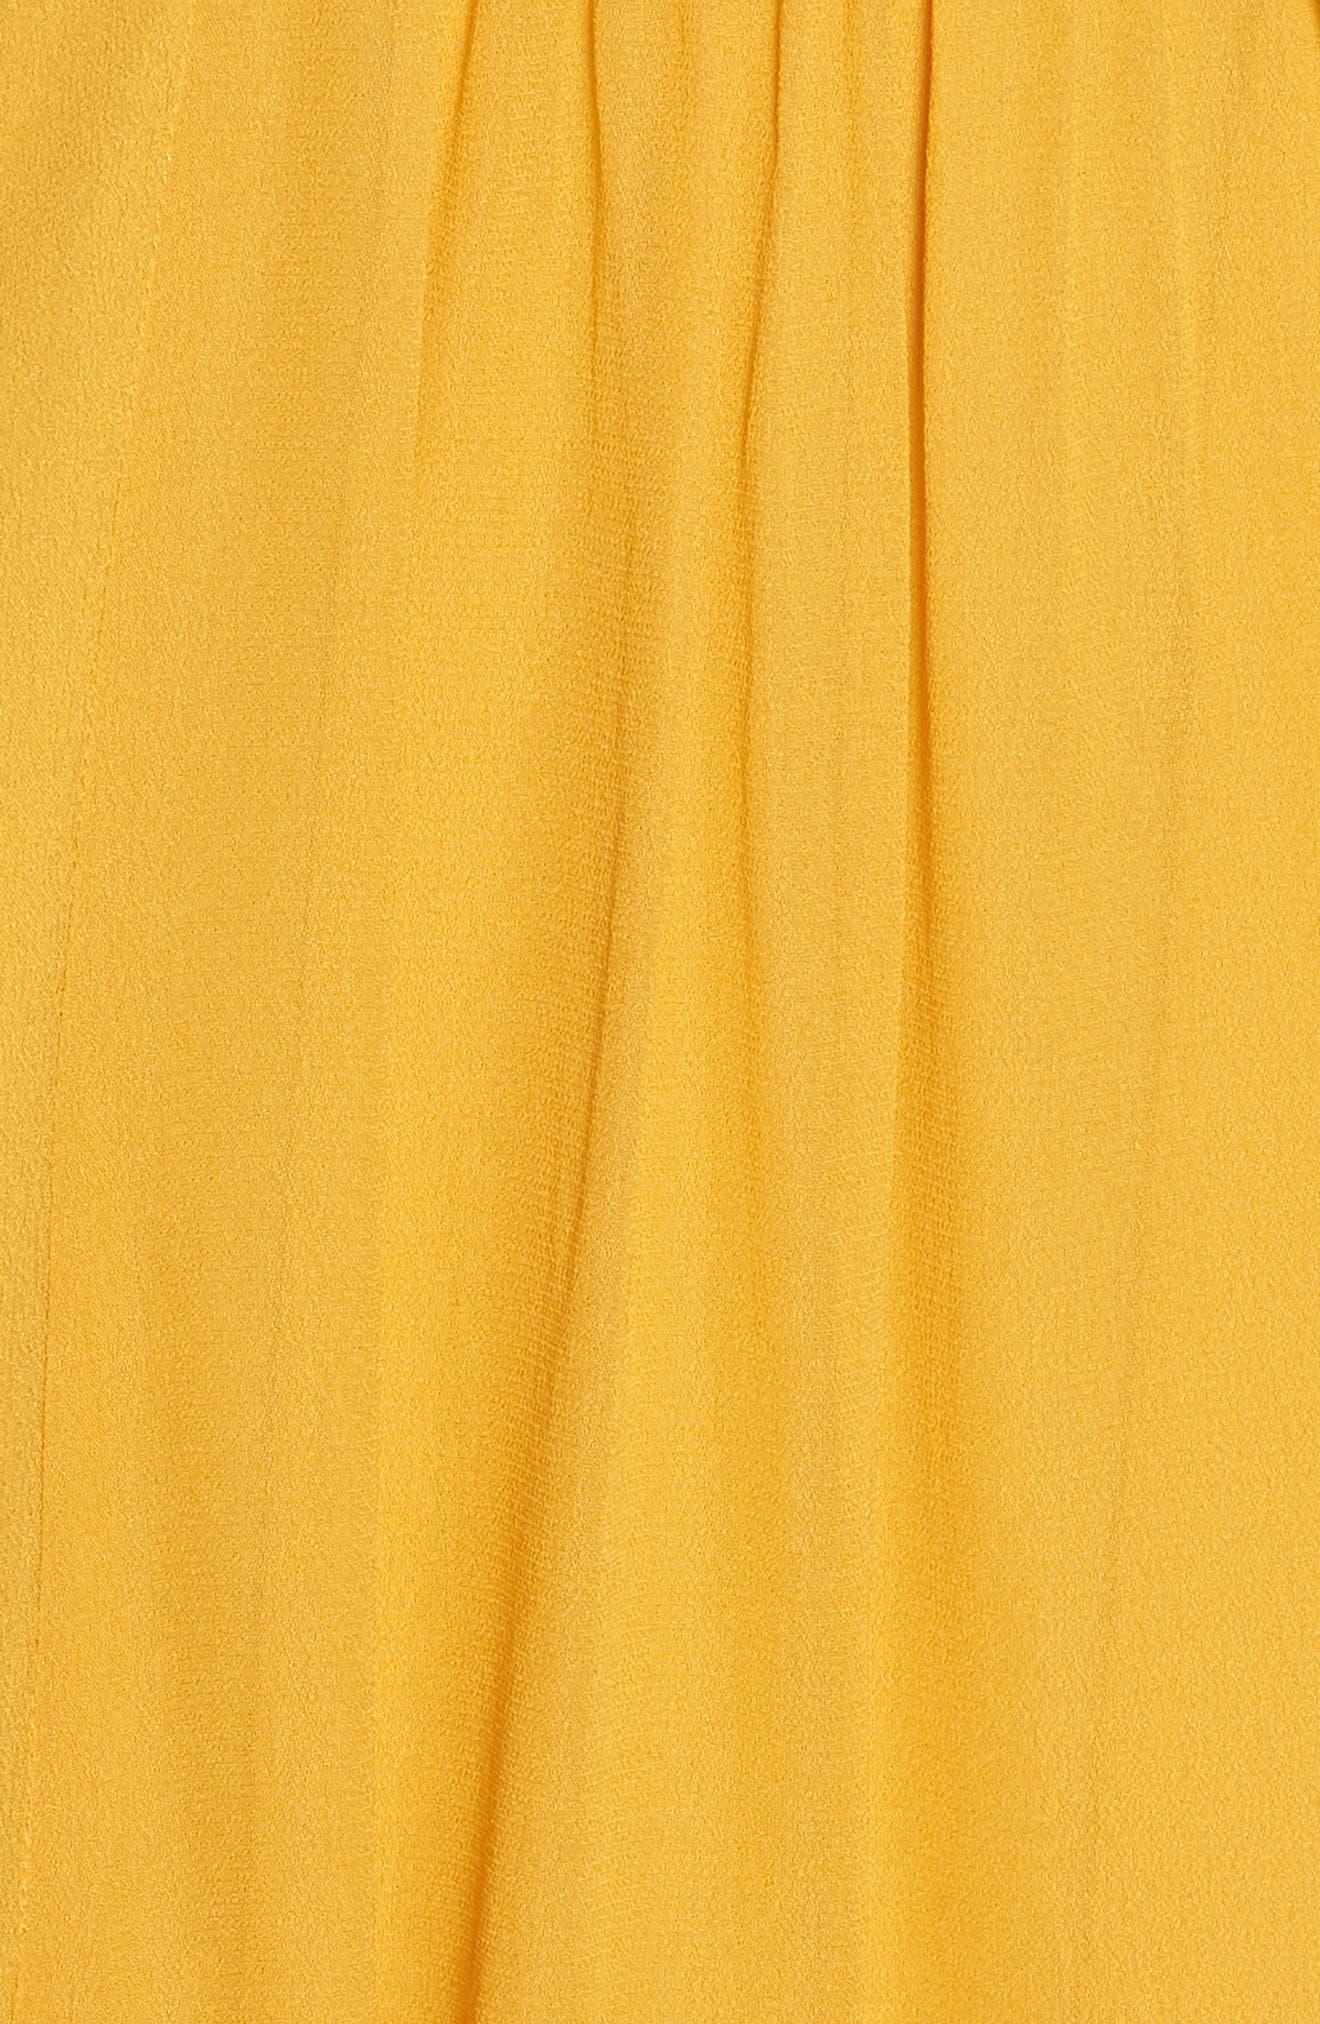 Embroidered Yoke Trapeze Dress,                             Alternate thumbnail 6, color,                             200